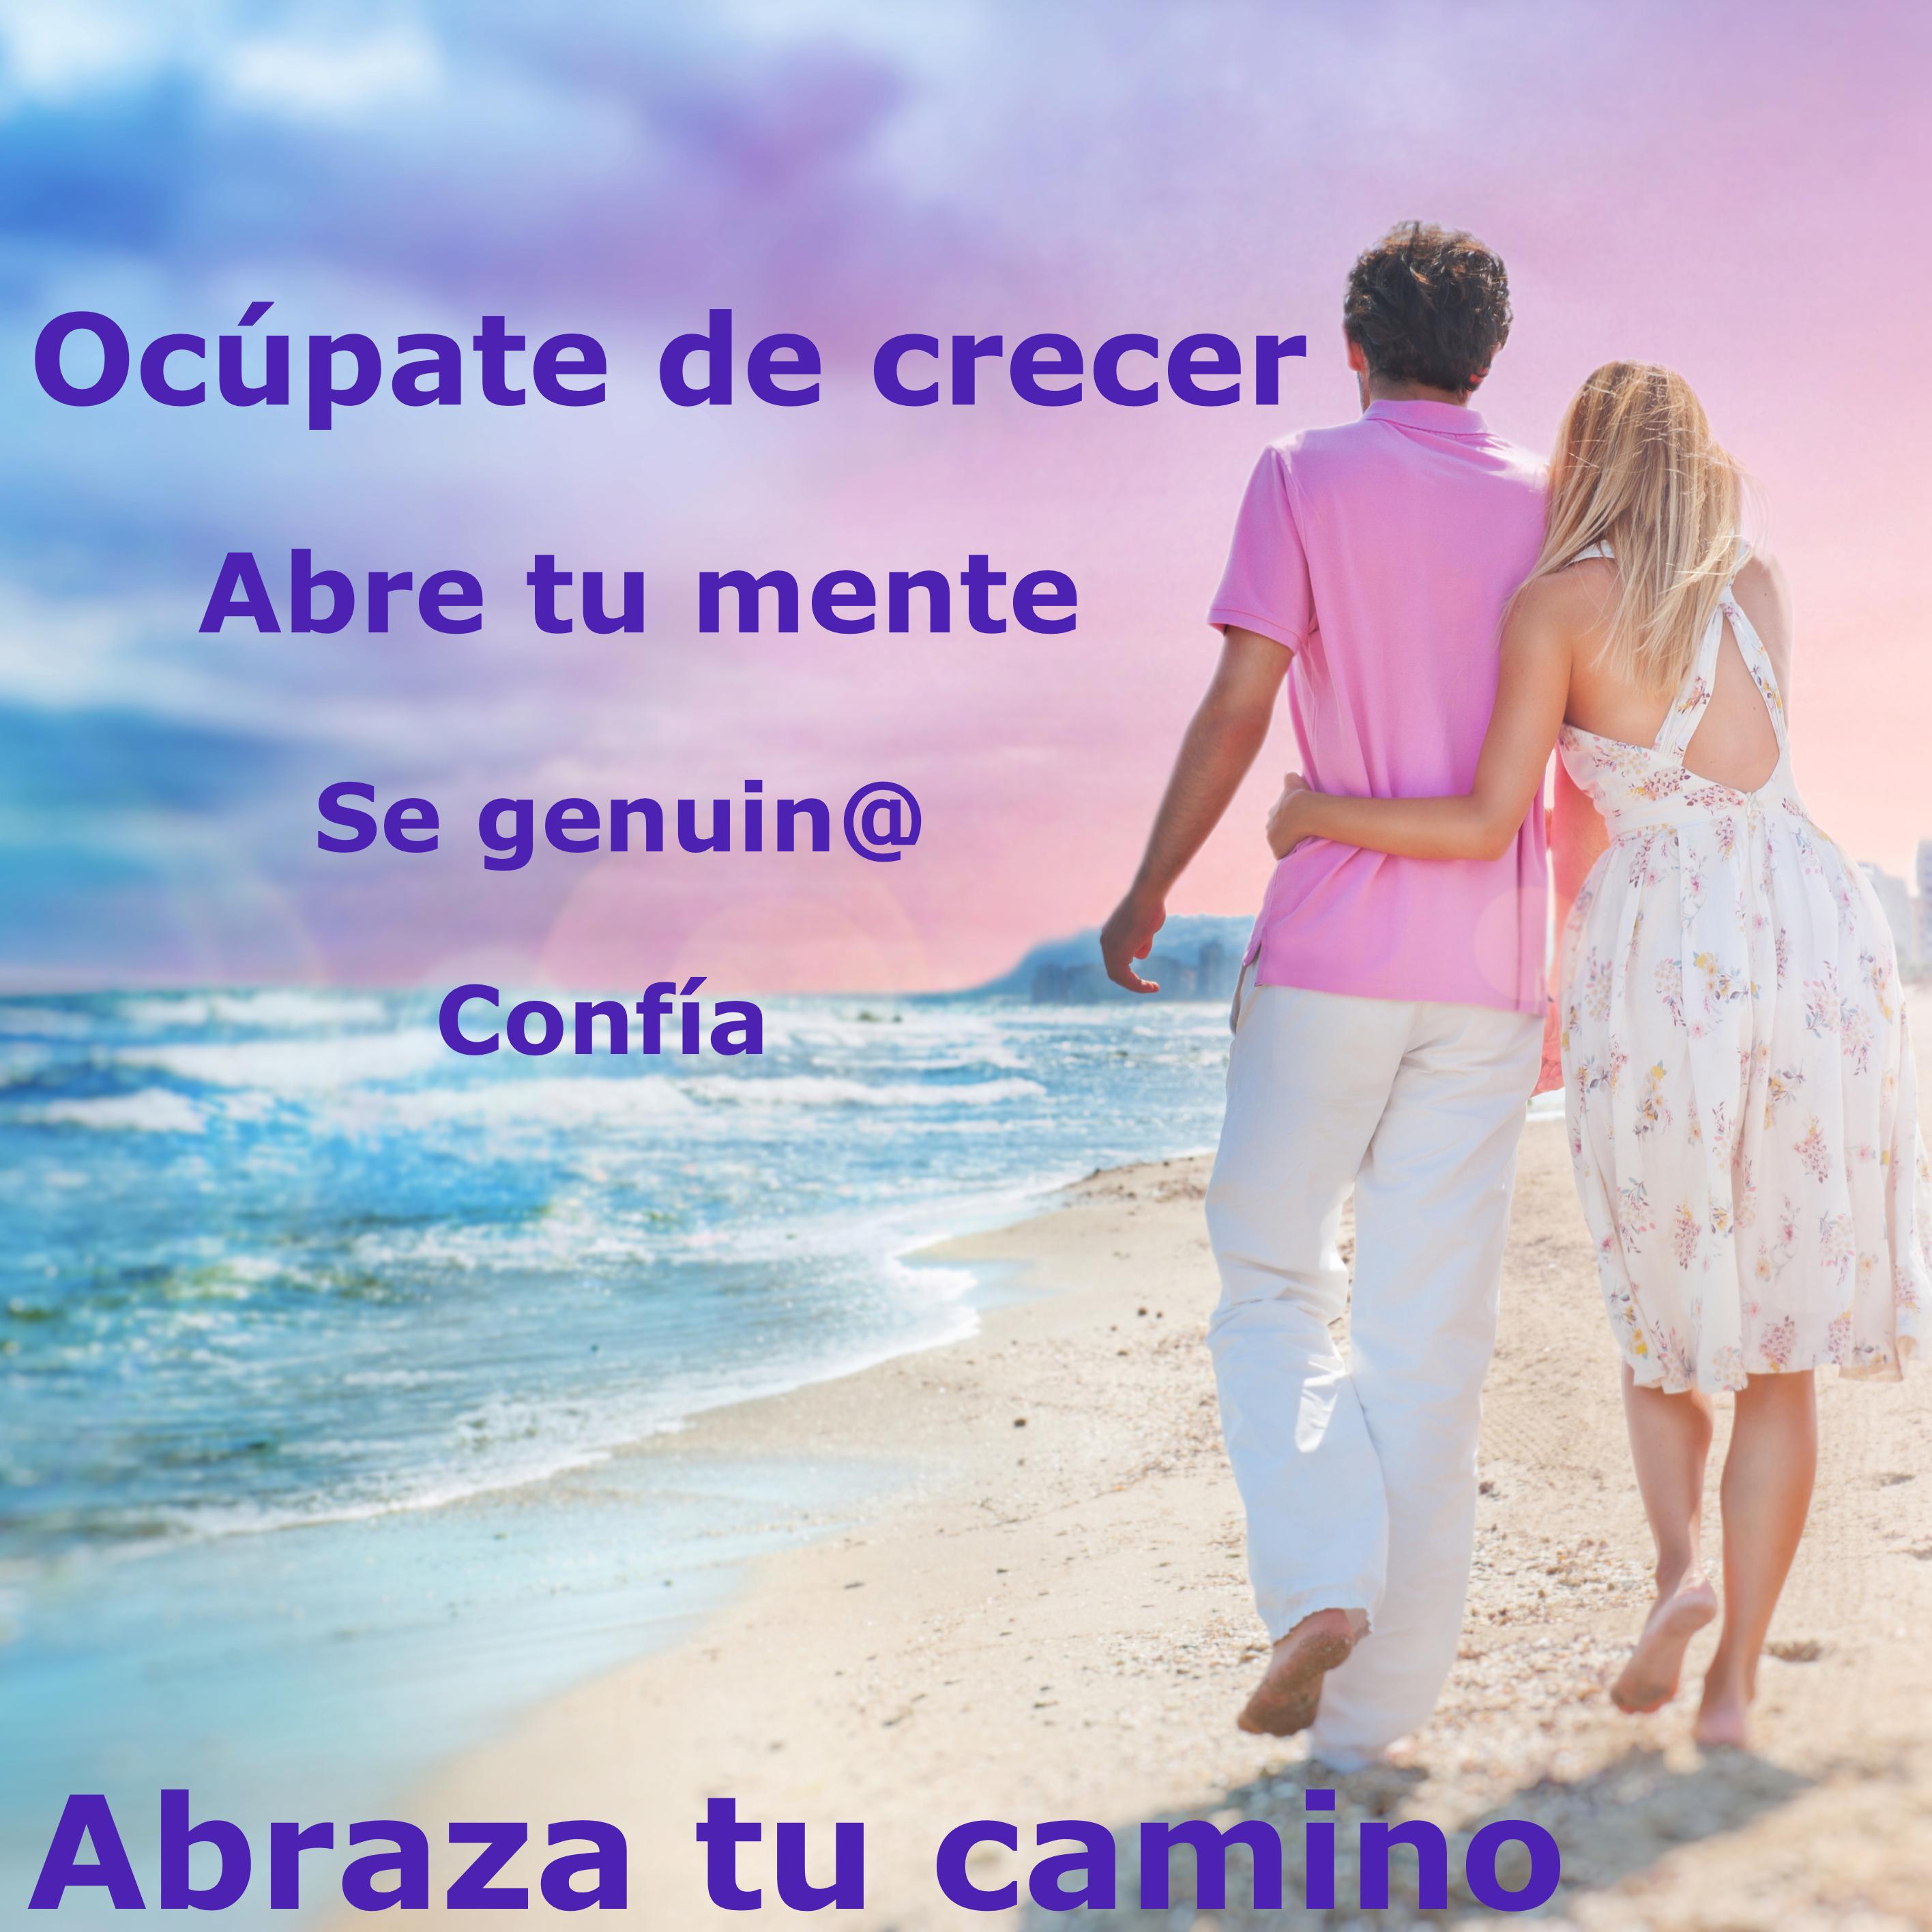 pareja-en-la-playa